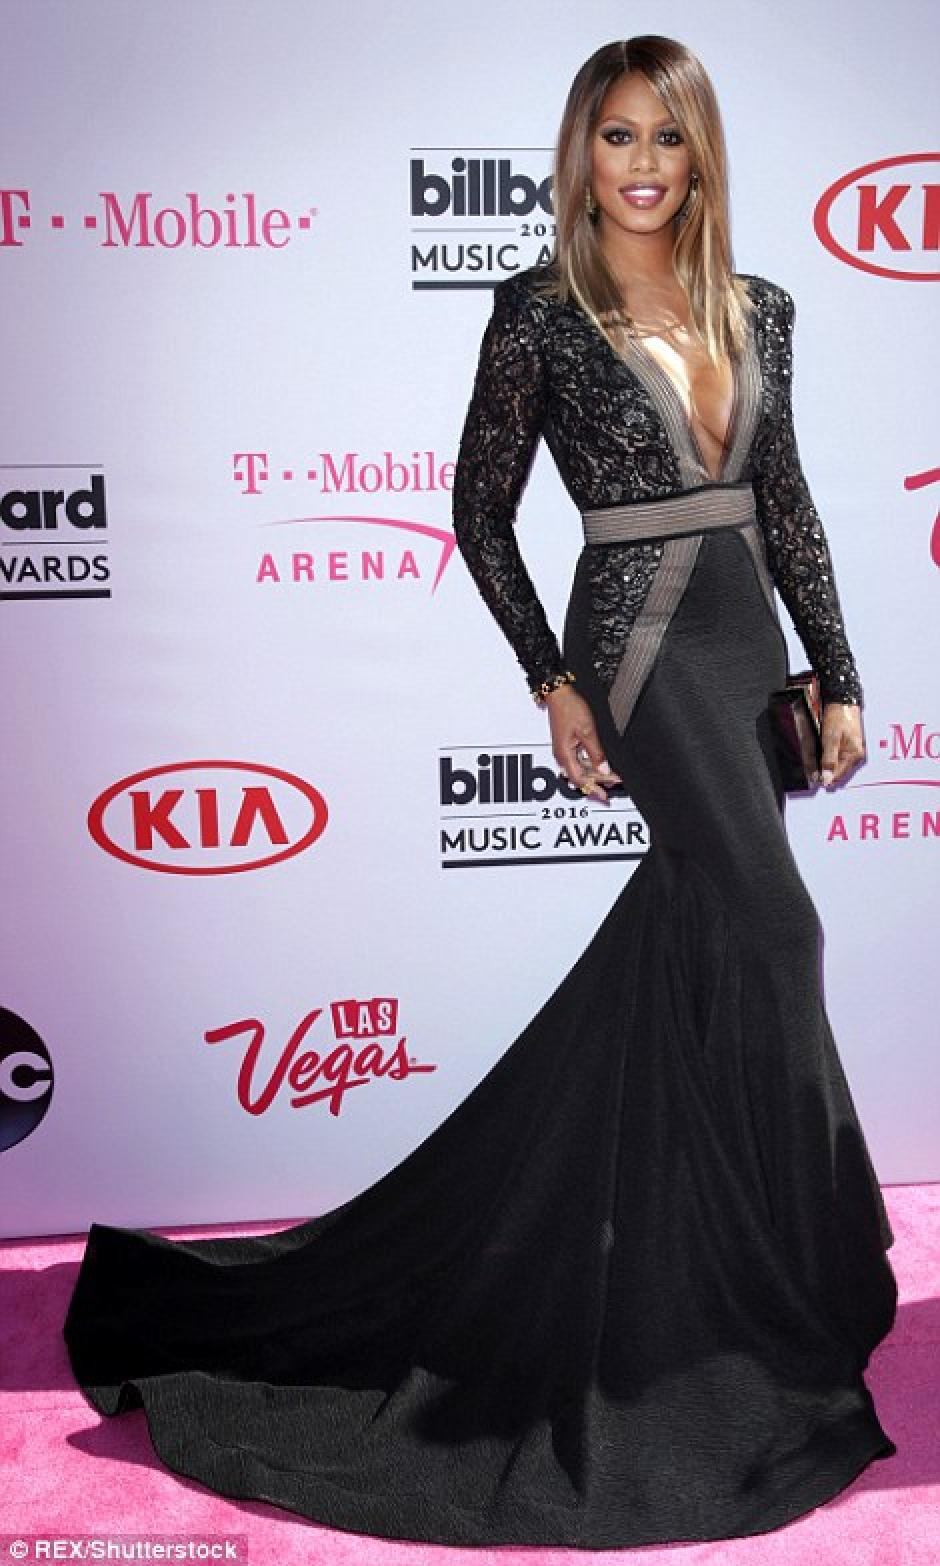 La artista transgénero Laverne Cox eligió un sexy vestido negro. (Foto: Rex/Shutterstock)